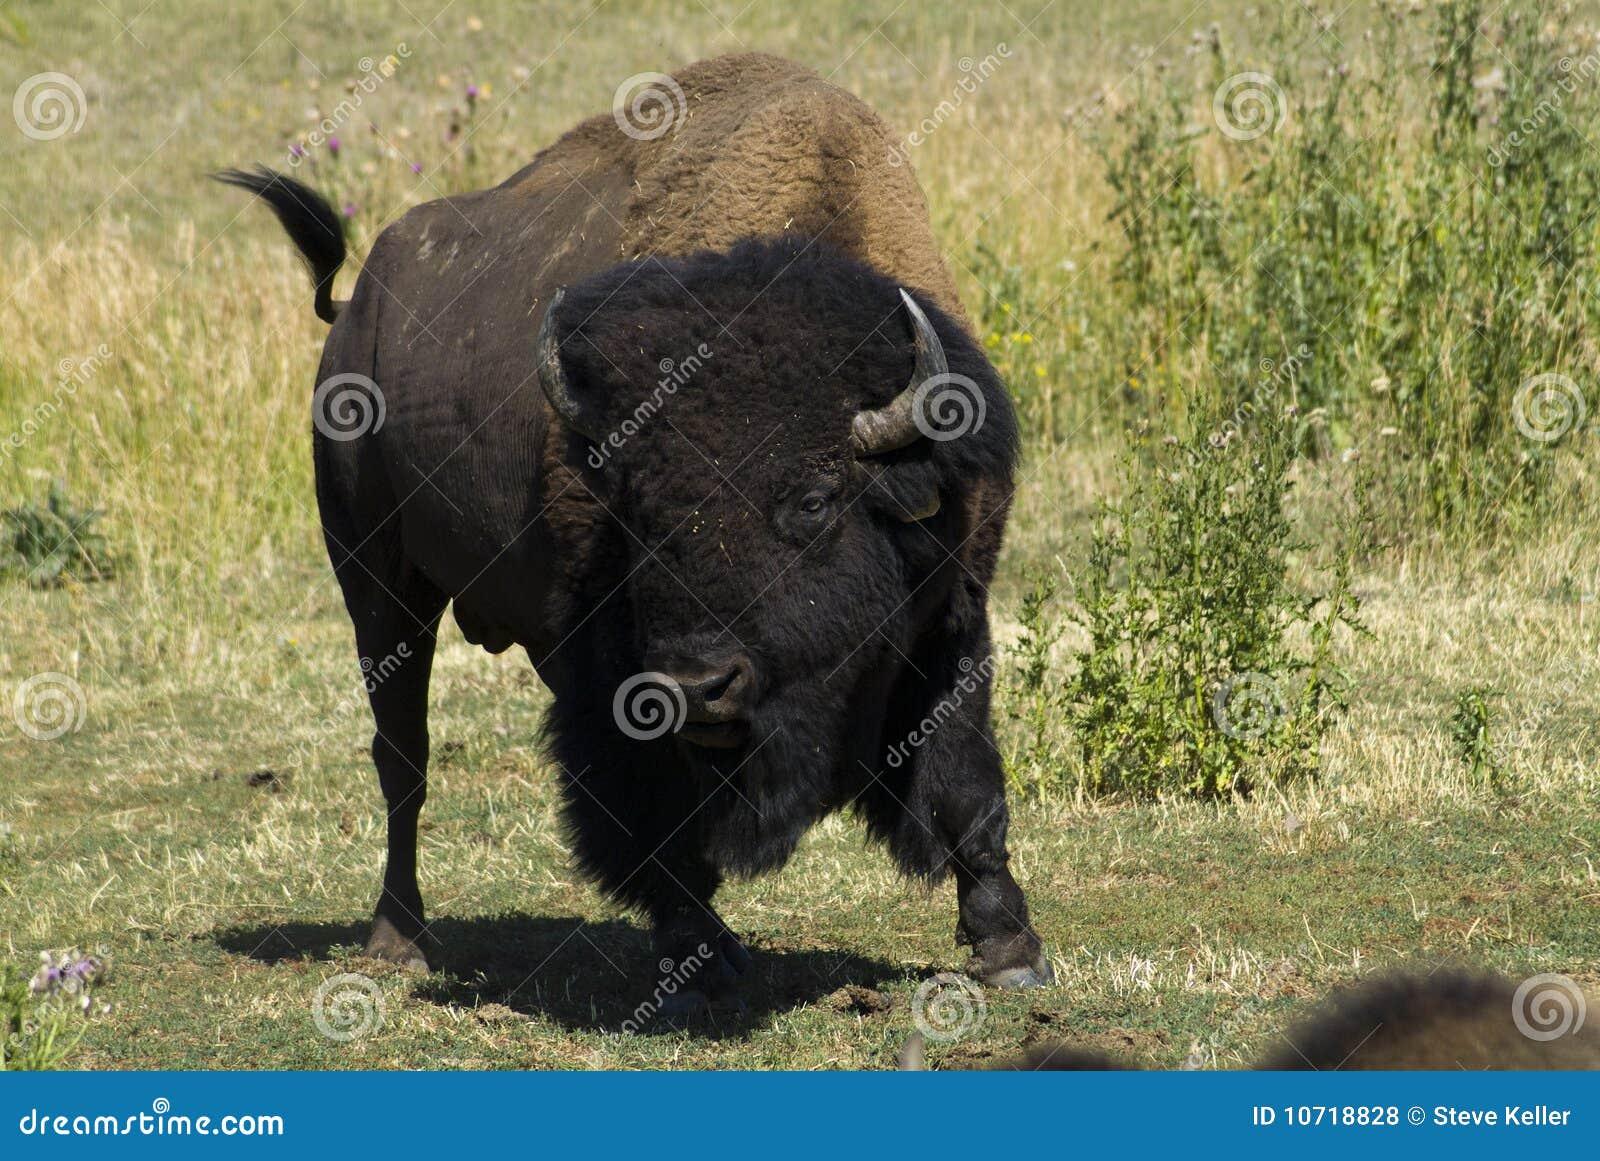 charging bison royalty free stock photos